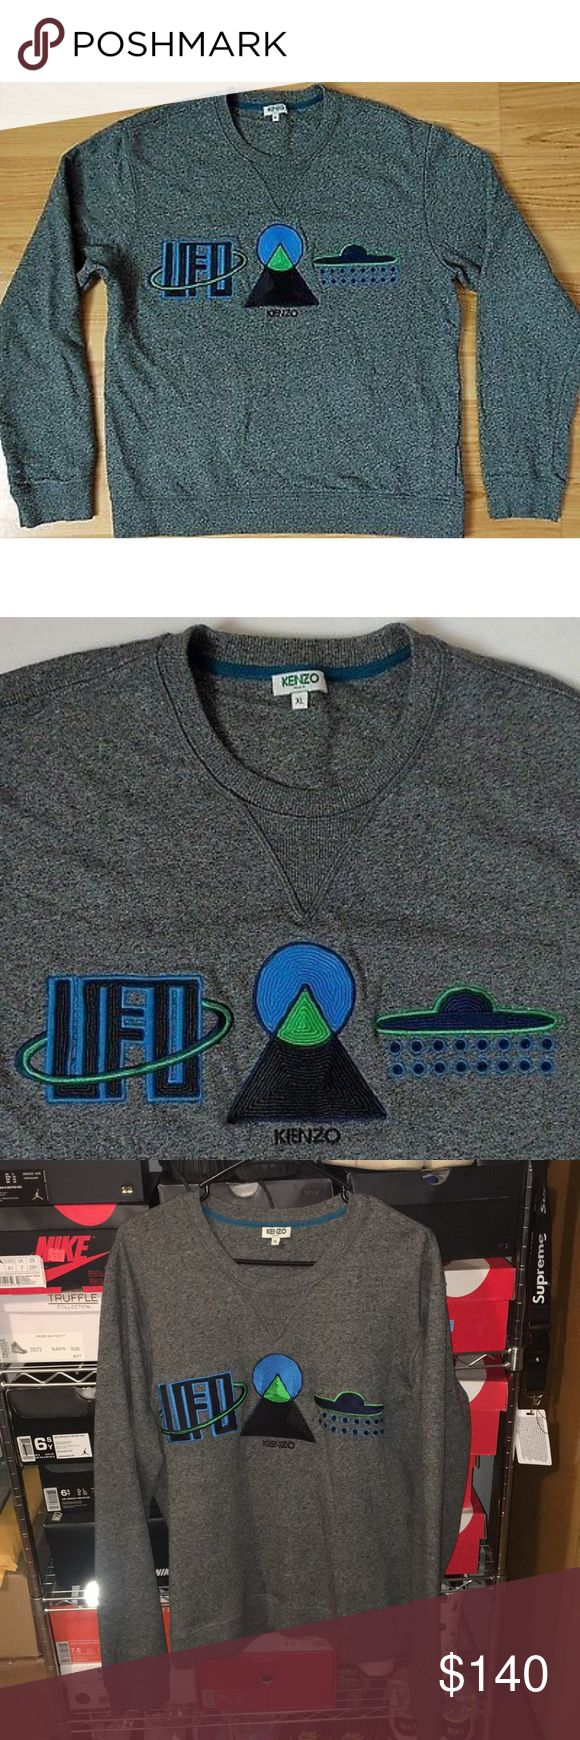 Kenzo Paris Mens XL Embroidered UFO Sweatshirt Kenzo Paris Mens XL Gray Embroidered UFO Sweatshirt Kenzo Shirts Sweatshirts & Hoodies